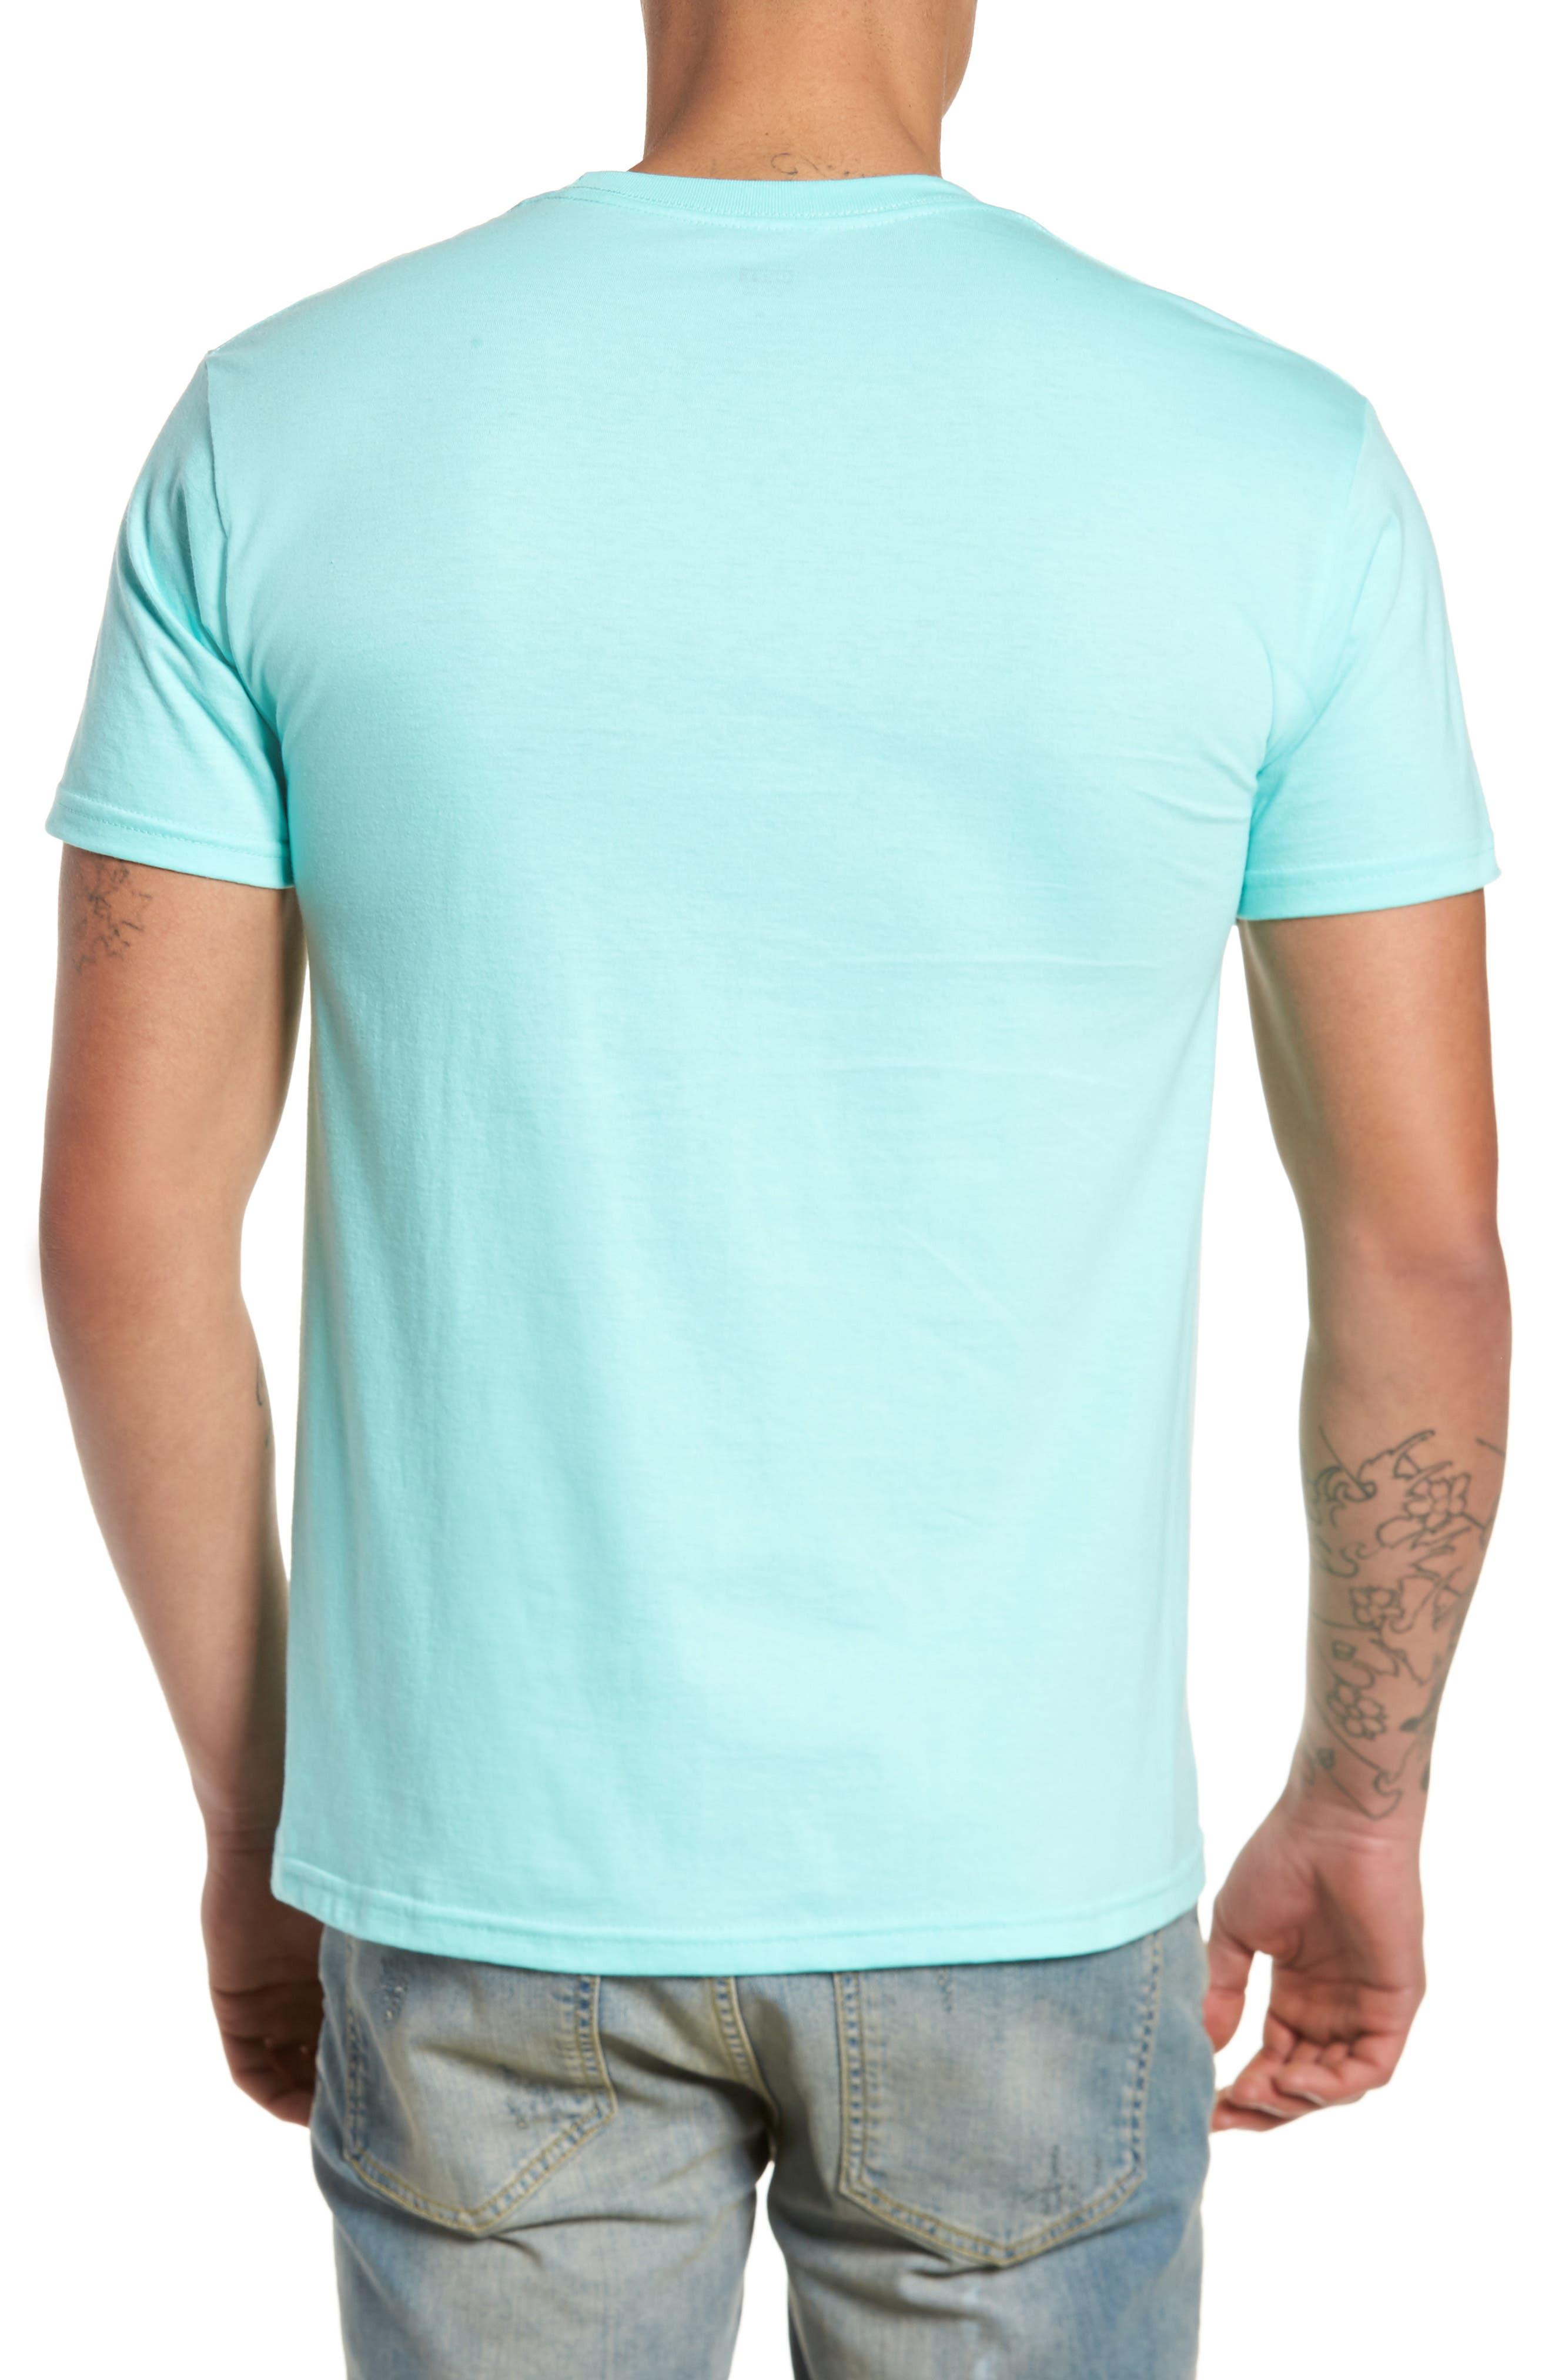 Can You Feel It Premium T-Shirt,                             Alternate thumbnail 2, color,                             450